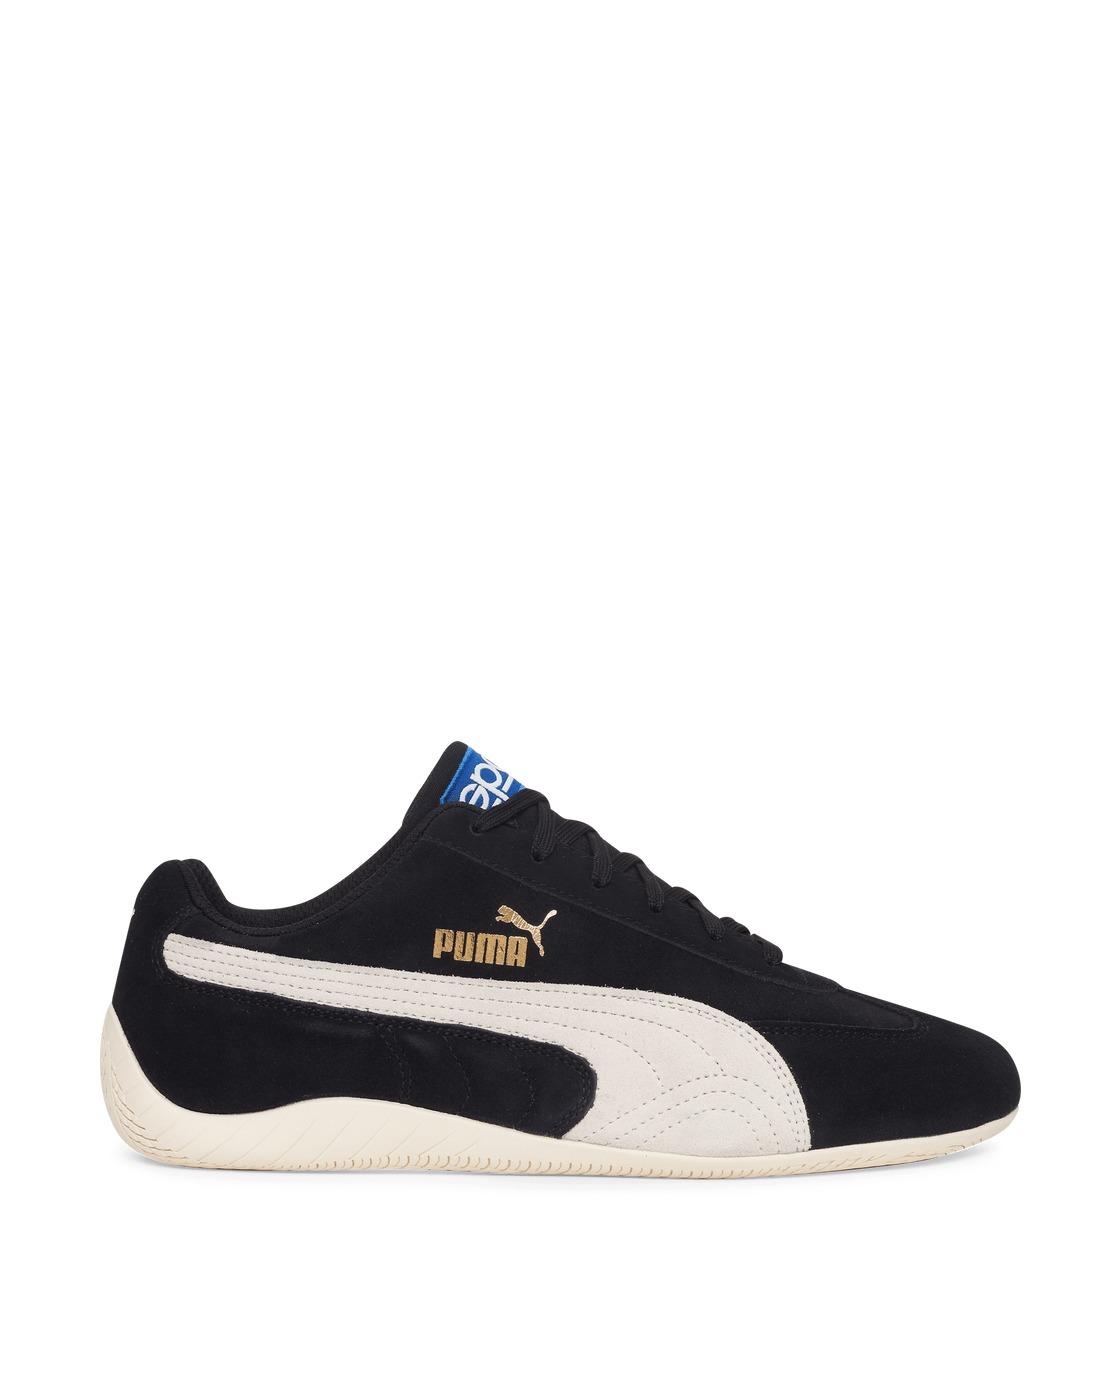 Photo: Puma Speedcat Sparco Sneakers Puma Black Whisper White